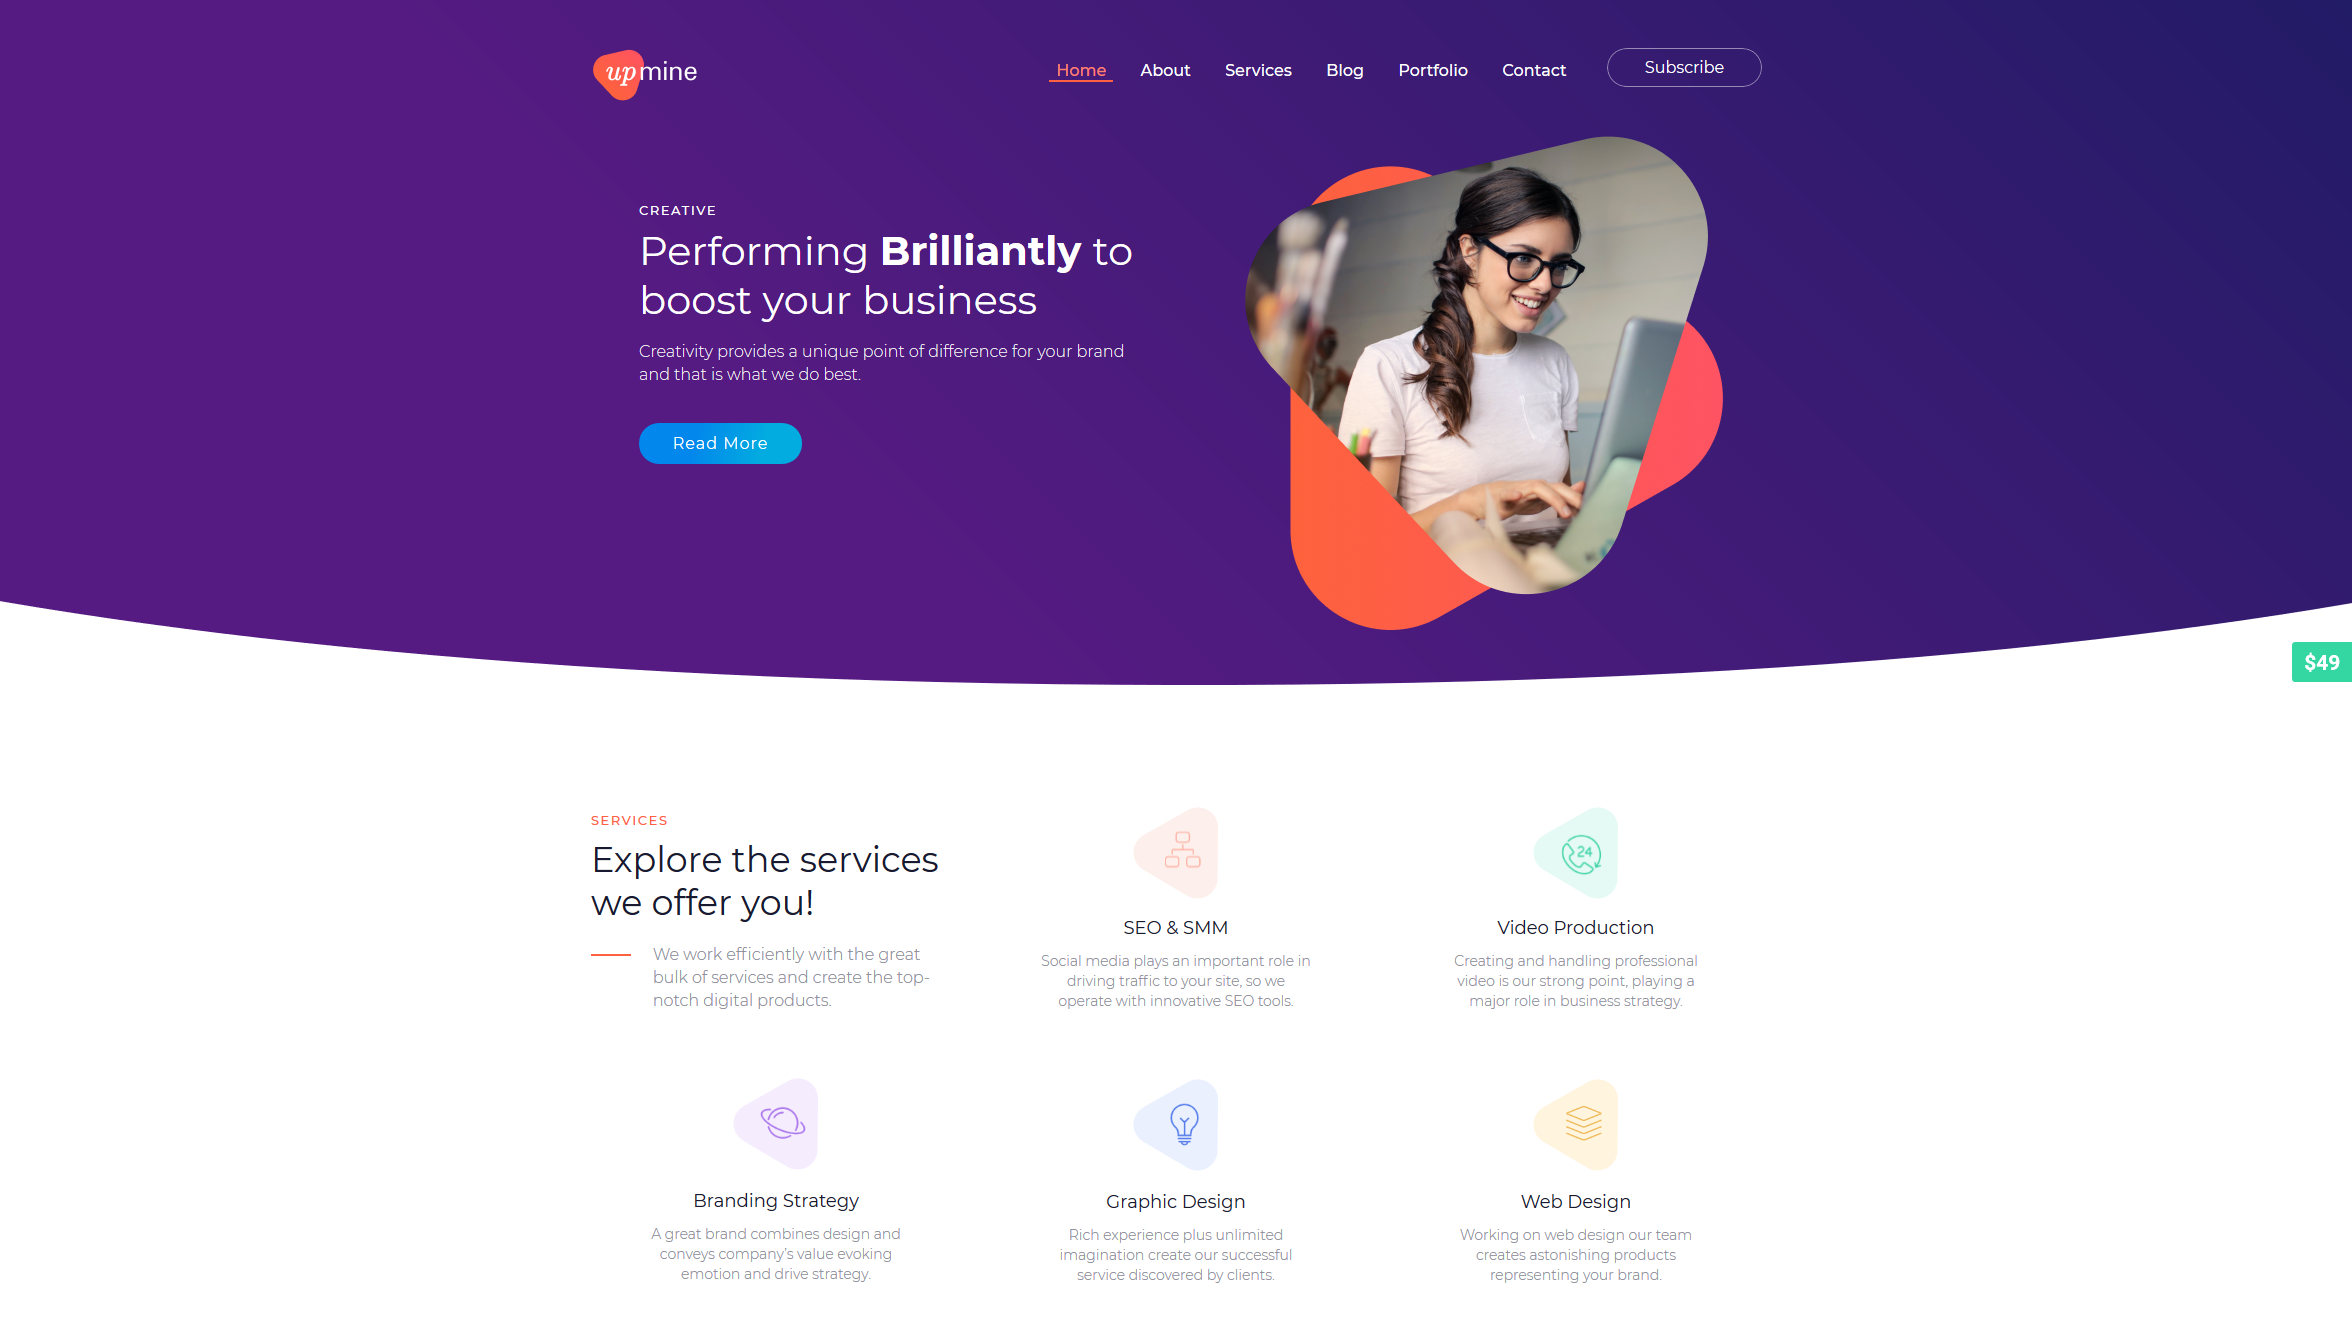 Screenshot_2019-02-21 Upmine – Just another WordPress site